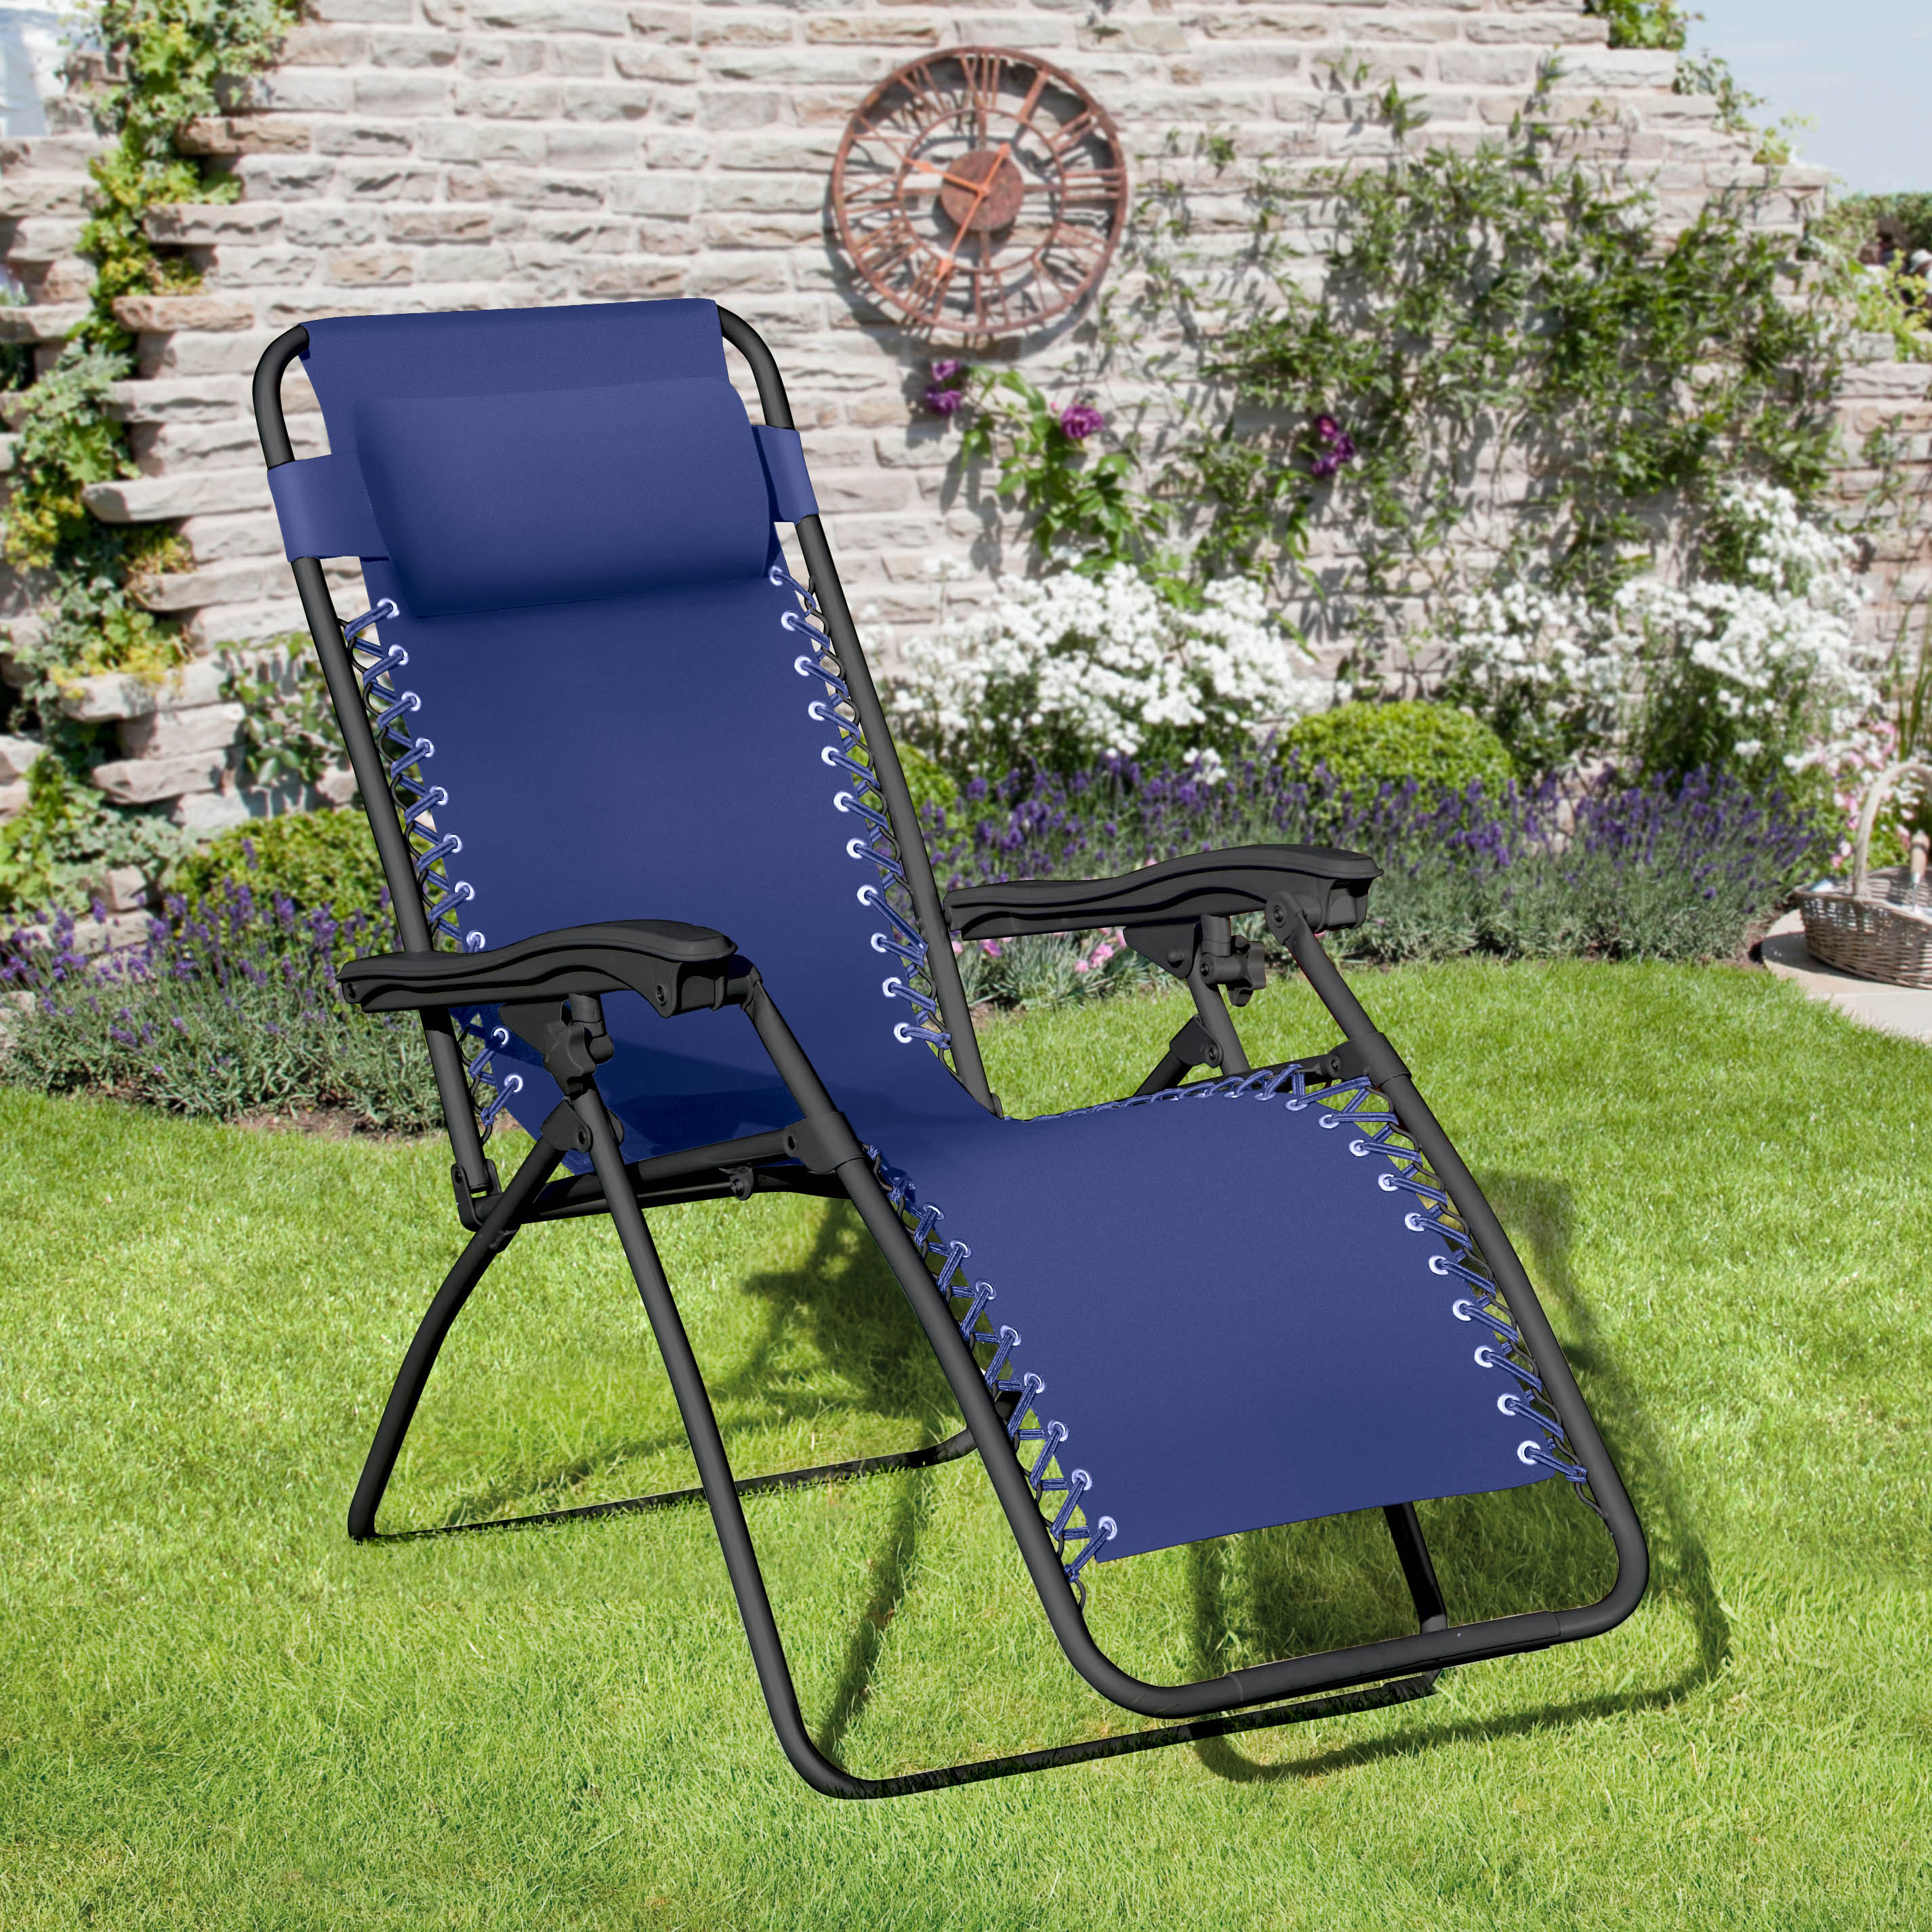 Suntime Deluxe Navy Blue Royale Gravity Garden Chair